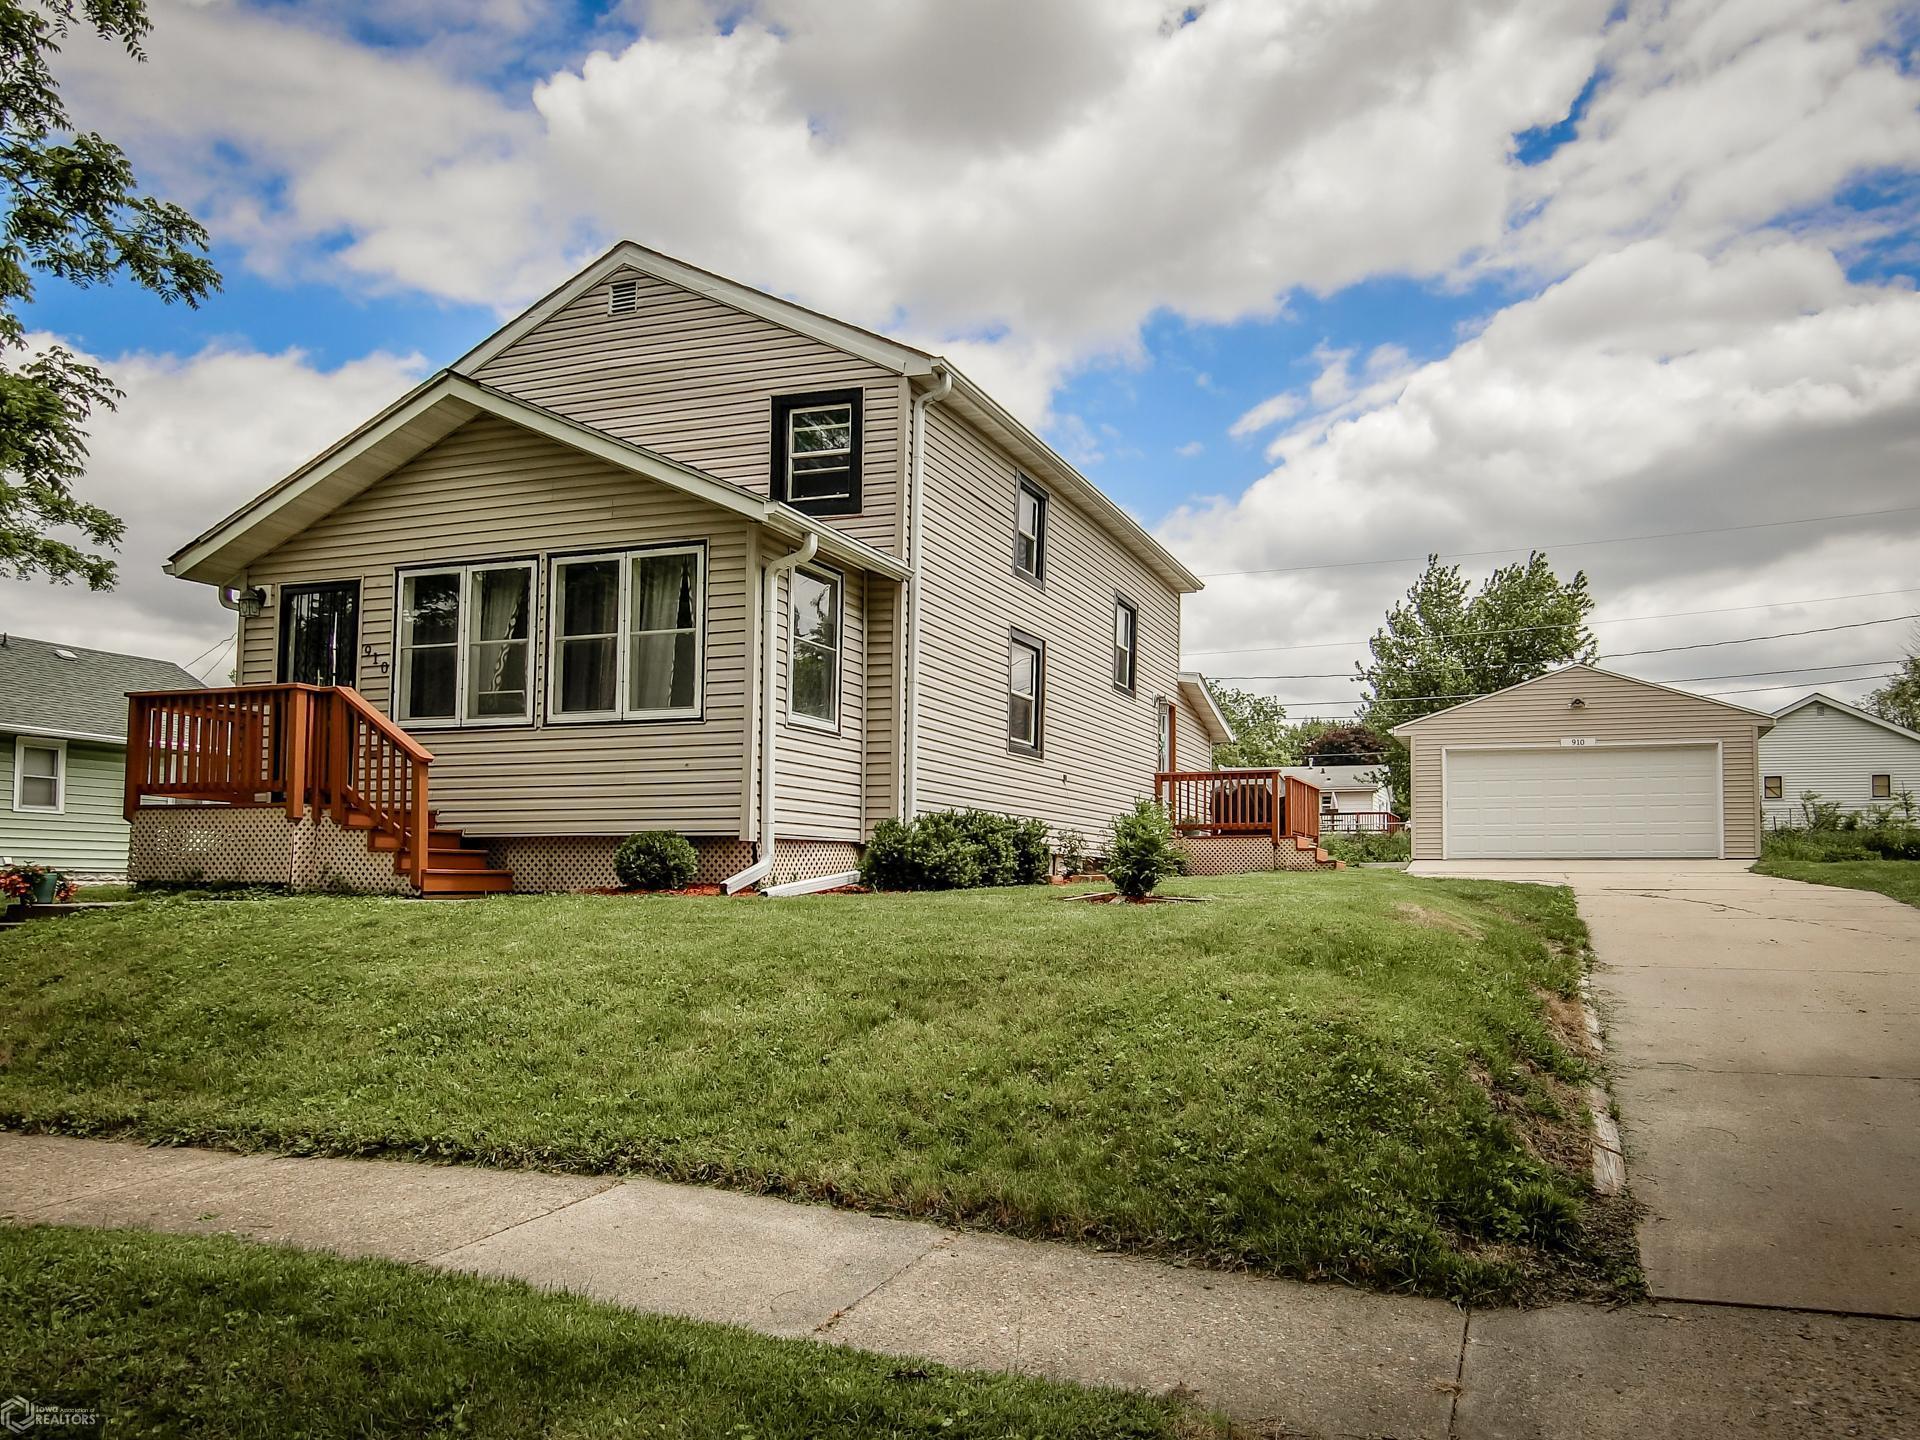 910 Finkle Property Photo - Marshalltown, IA real estate listing